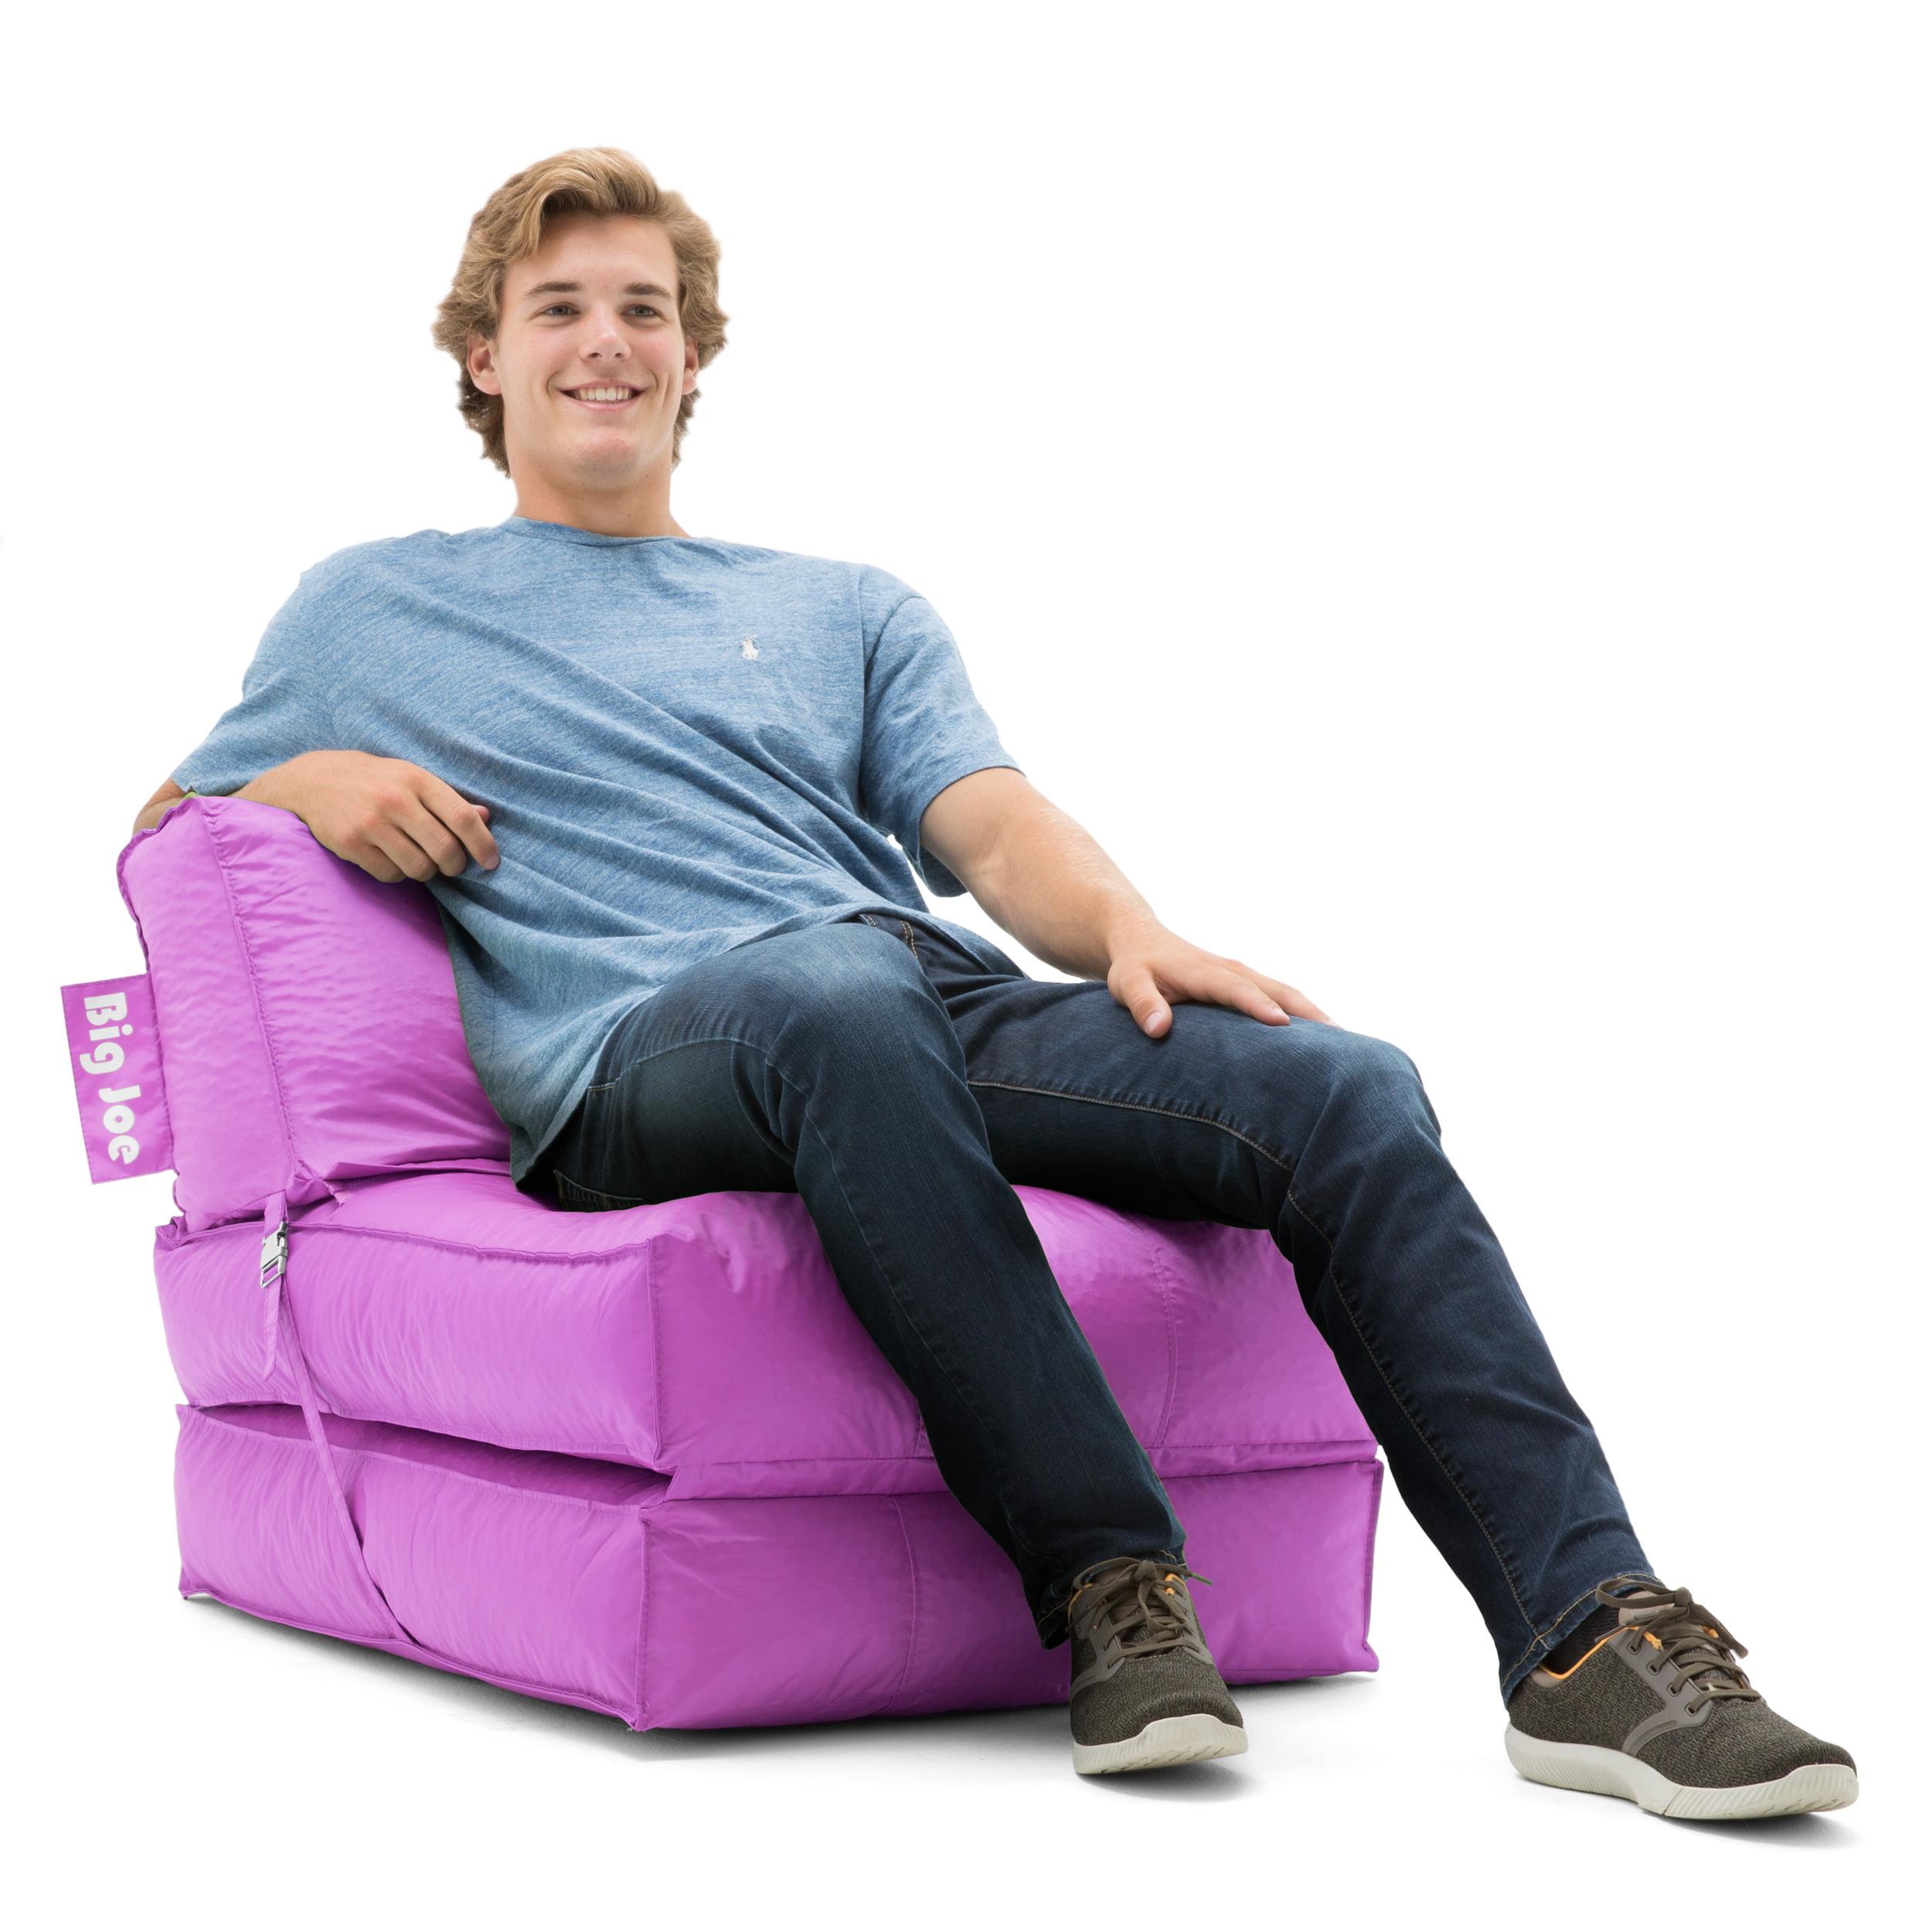 Big Joe Flip Lounger Beanbag Chair by Comfort Research